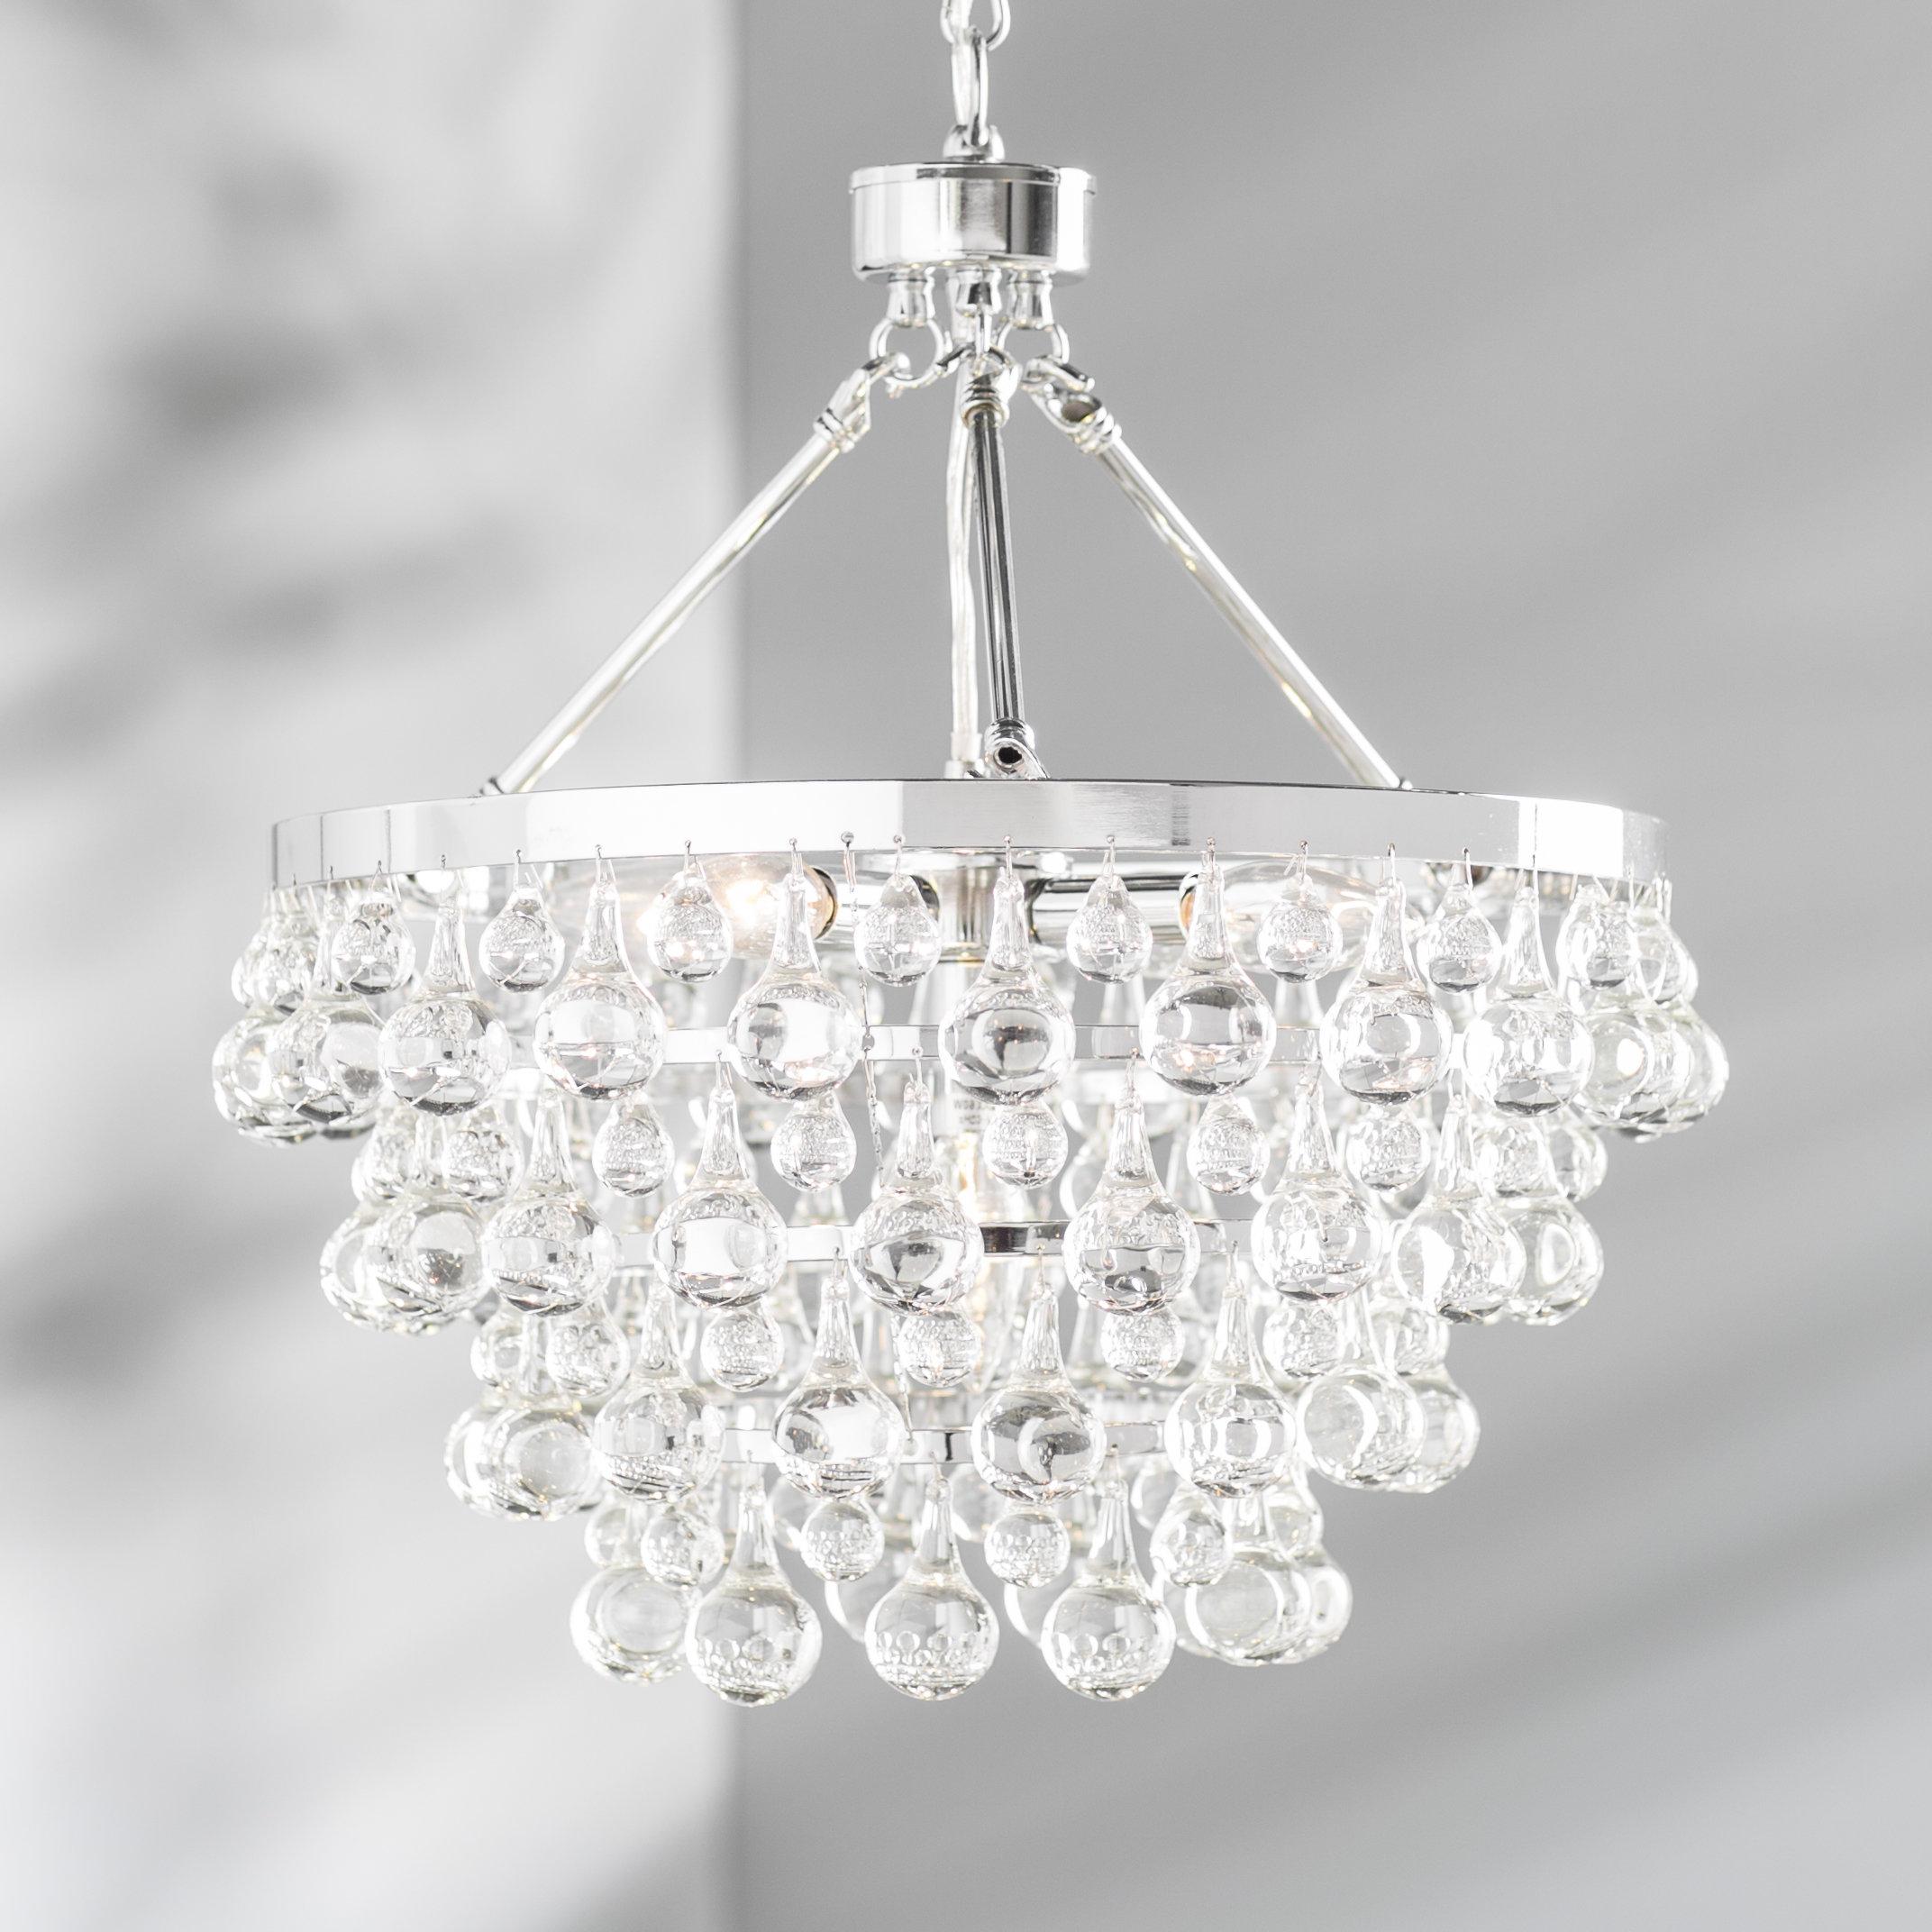 Fashionable Ahern 5 Light Crystal Chandelier Throughout Clea 3 Light Crystal Chandeliers (View 8 of 25)